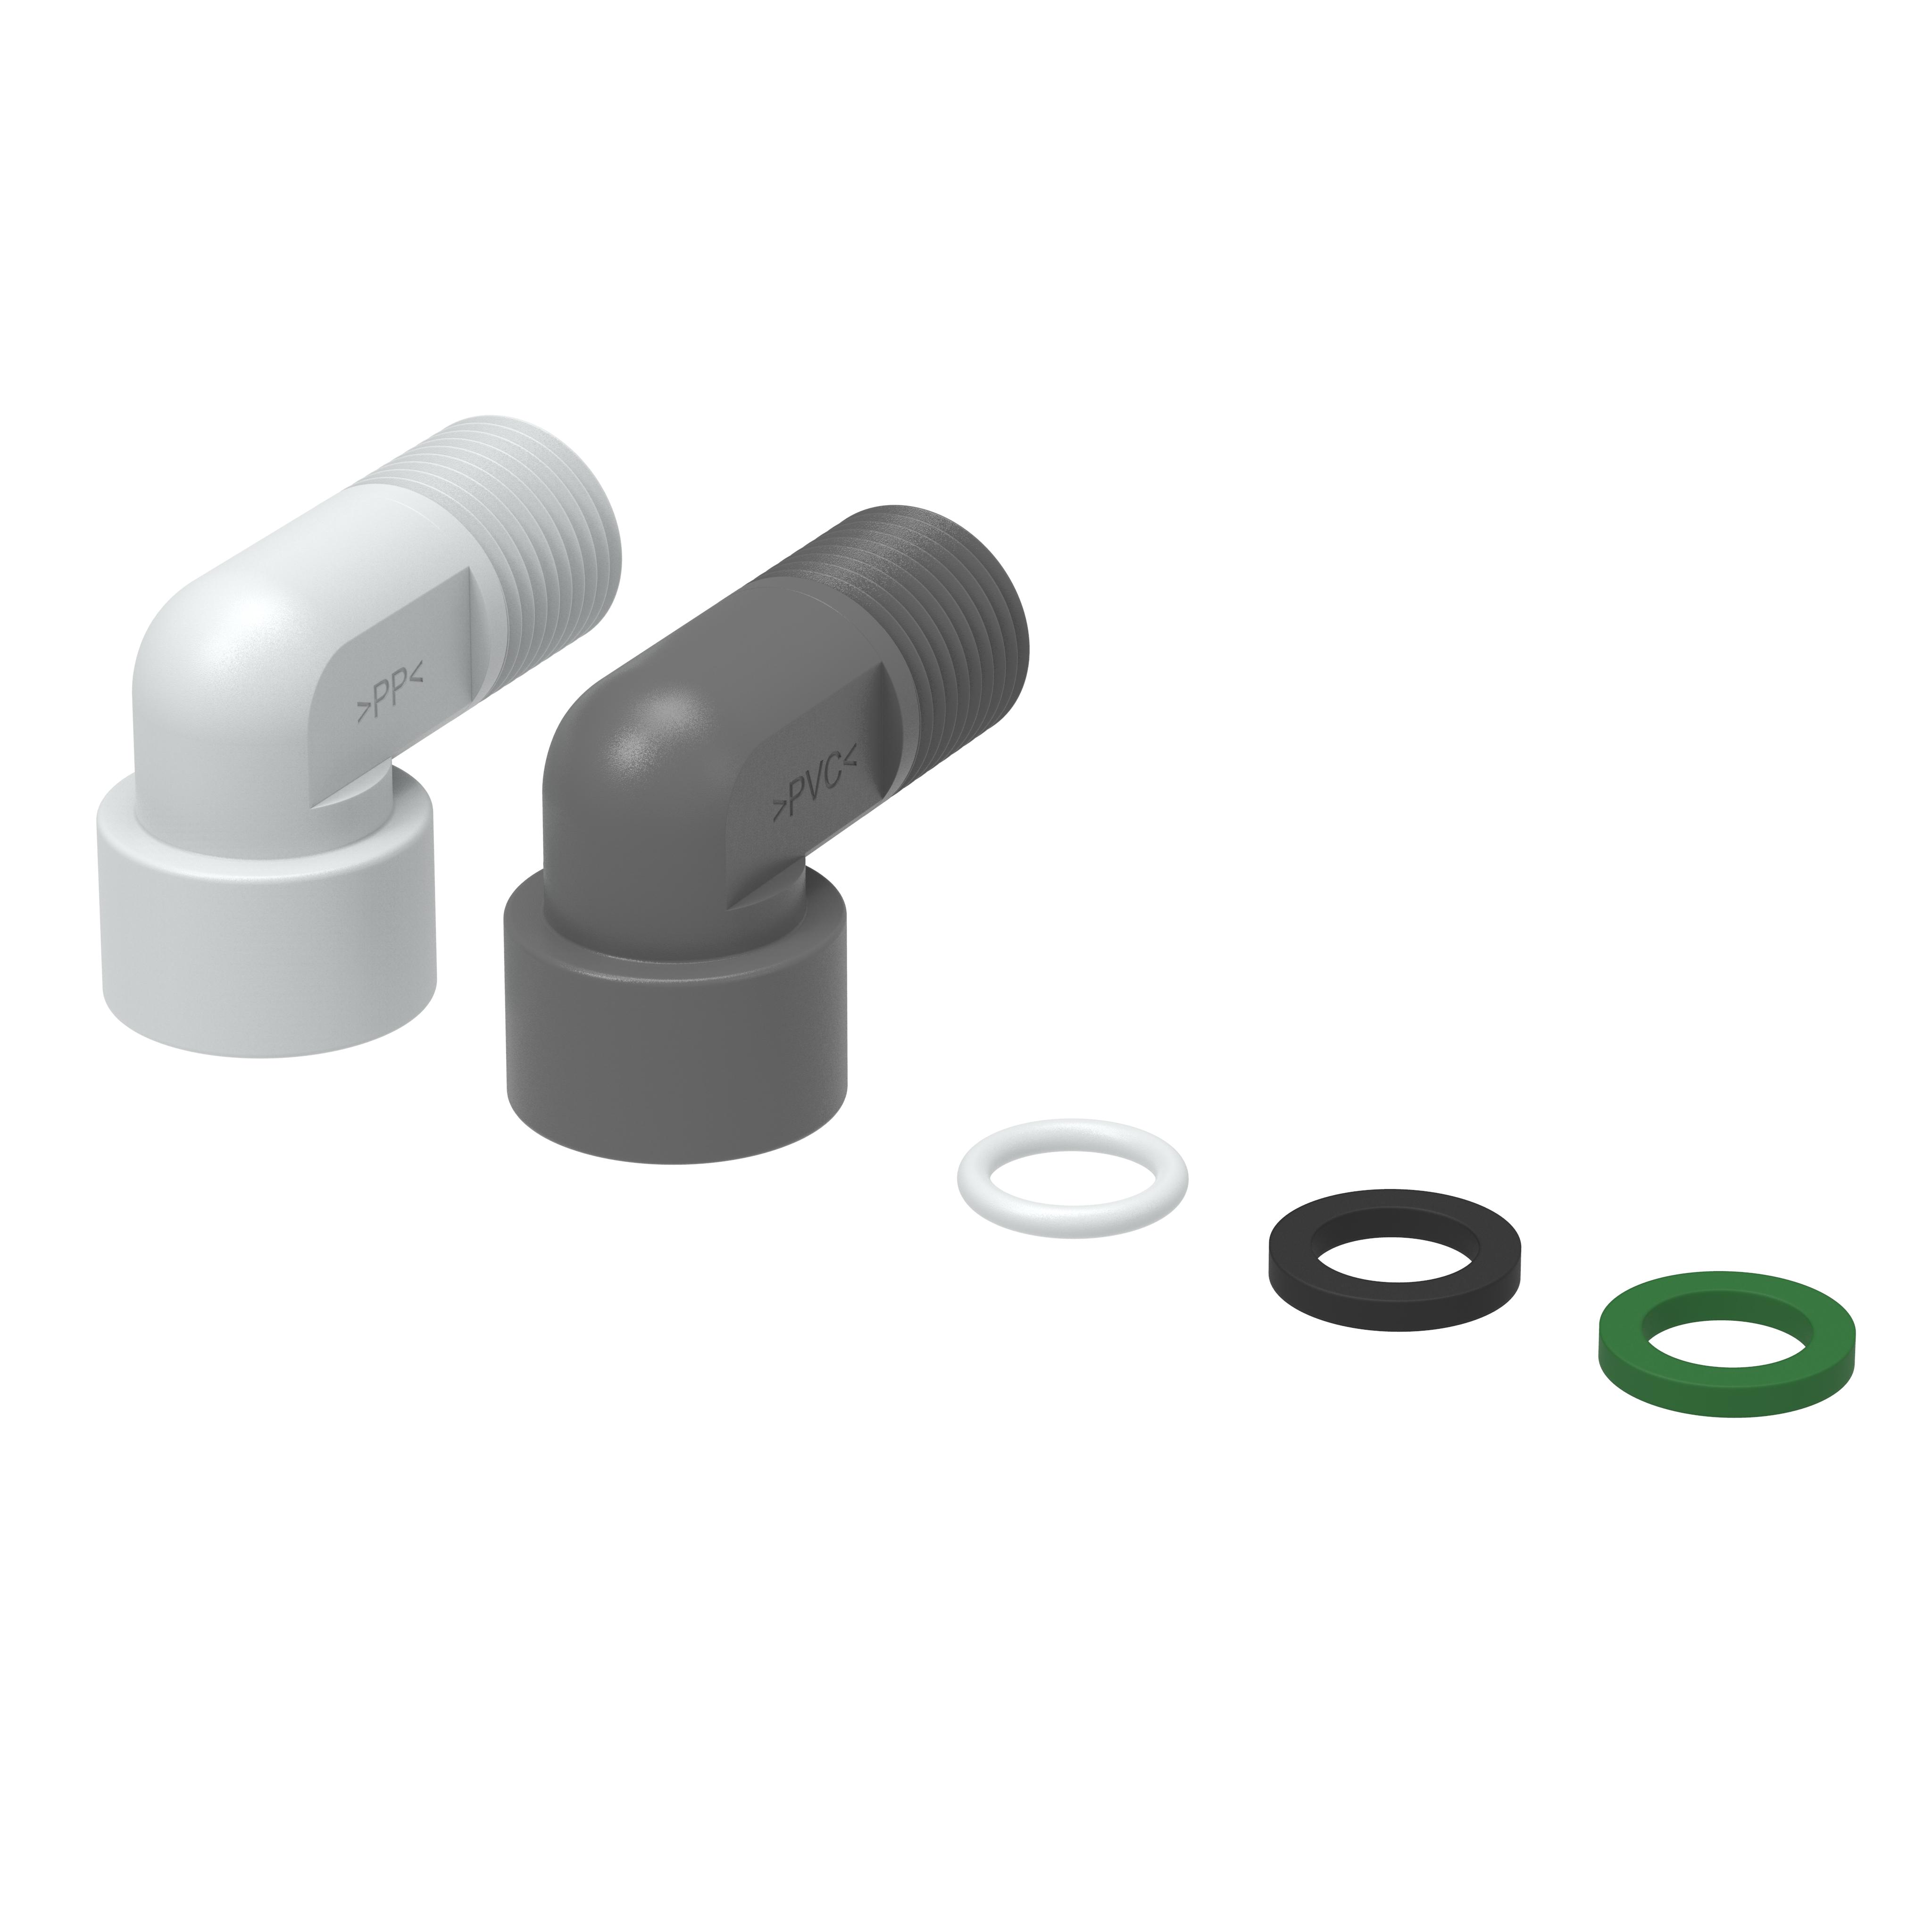 Zubehör Sauglanze - Winkelstück - 35207203 - PVC/PP